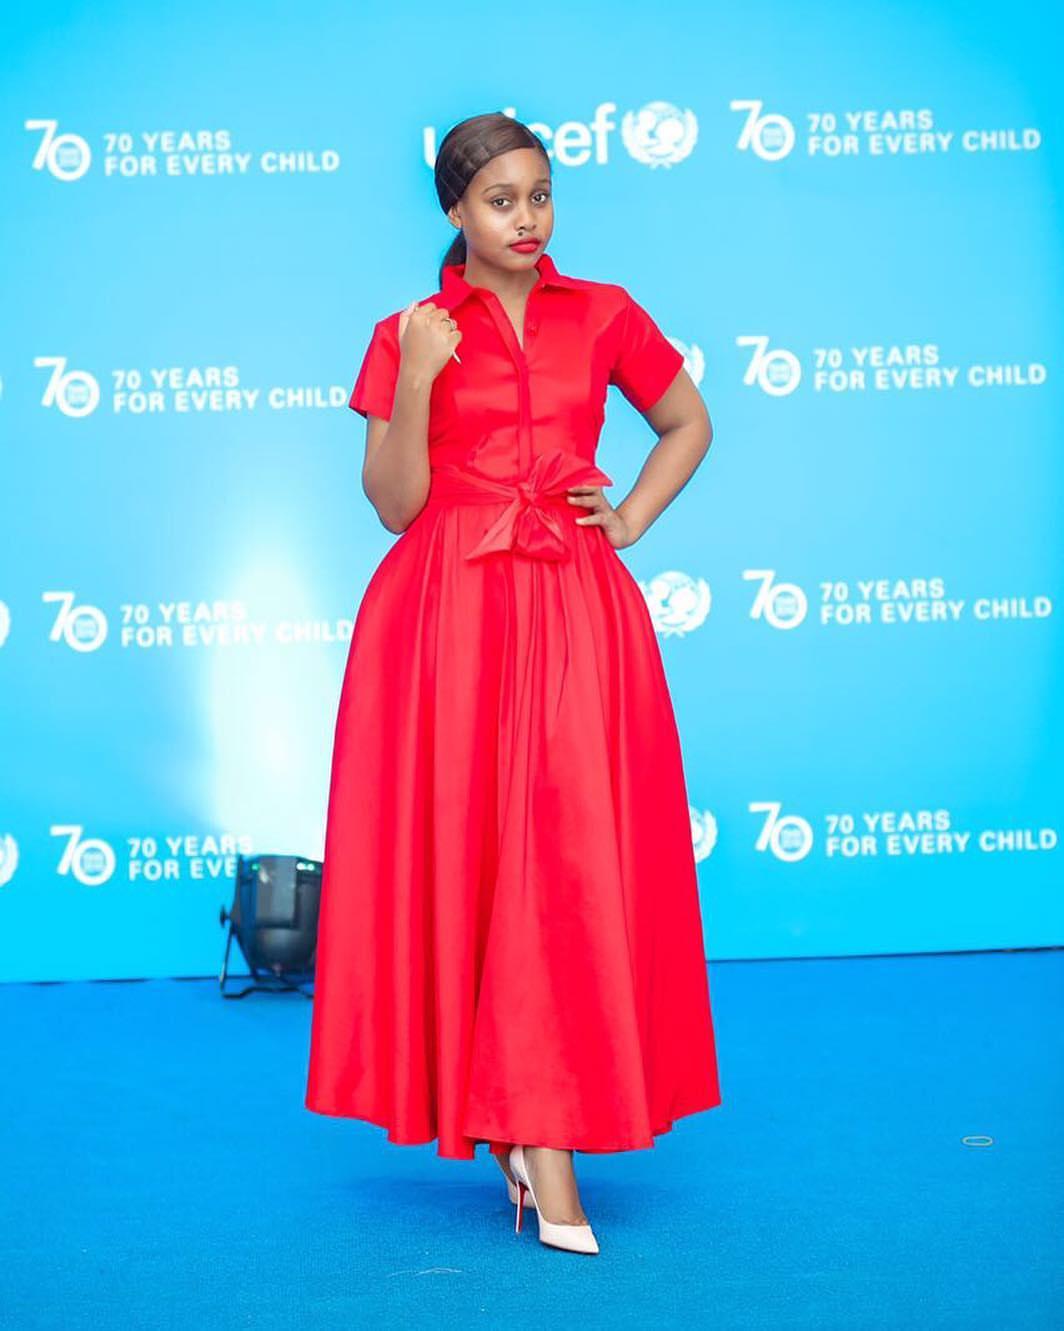 Jokate-Mwegelo-Outfits-style-fashion